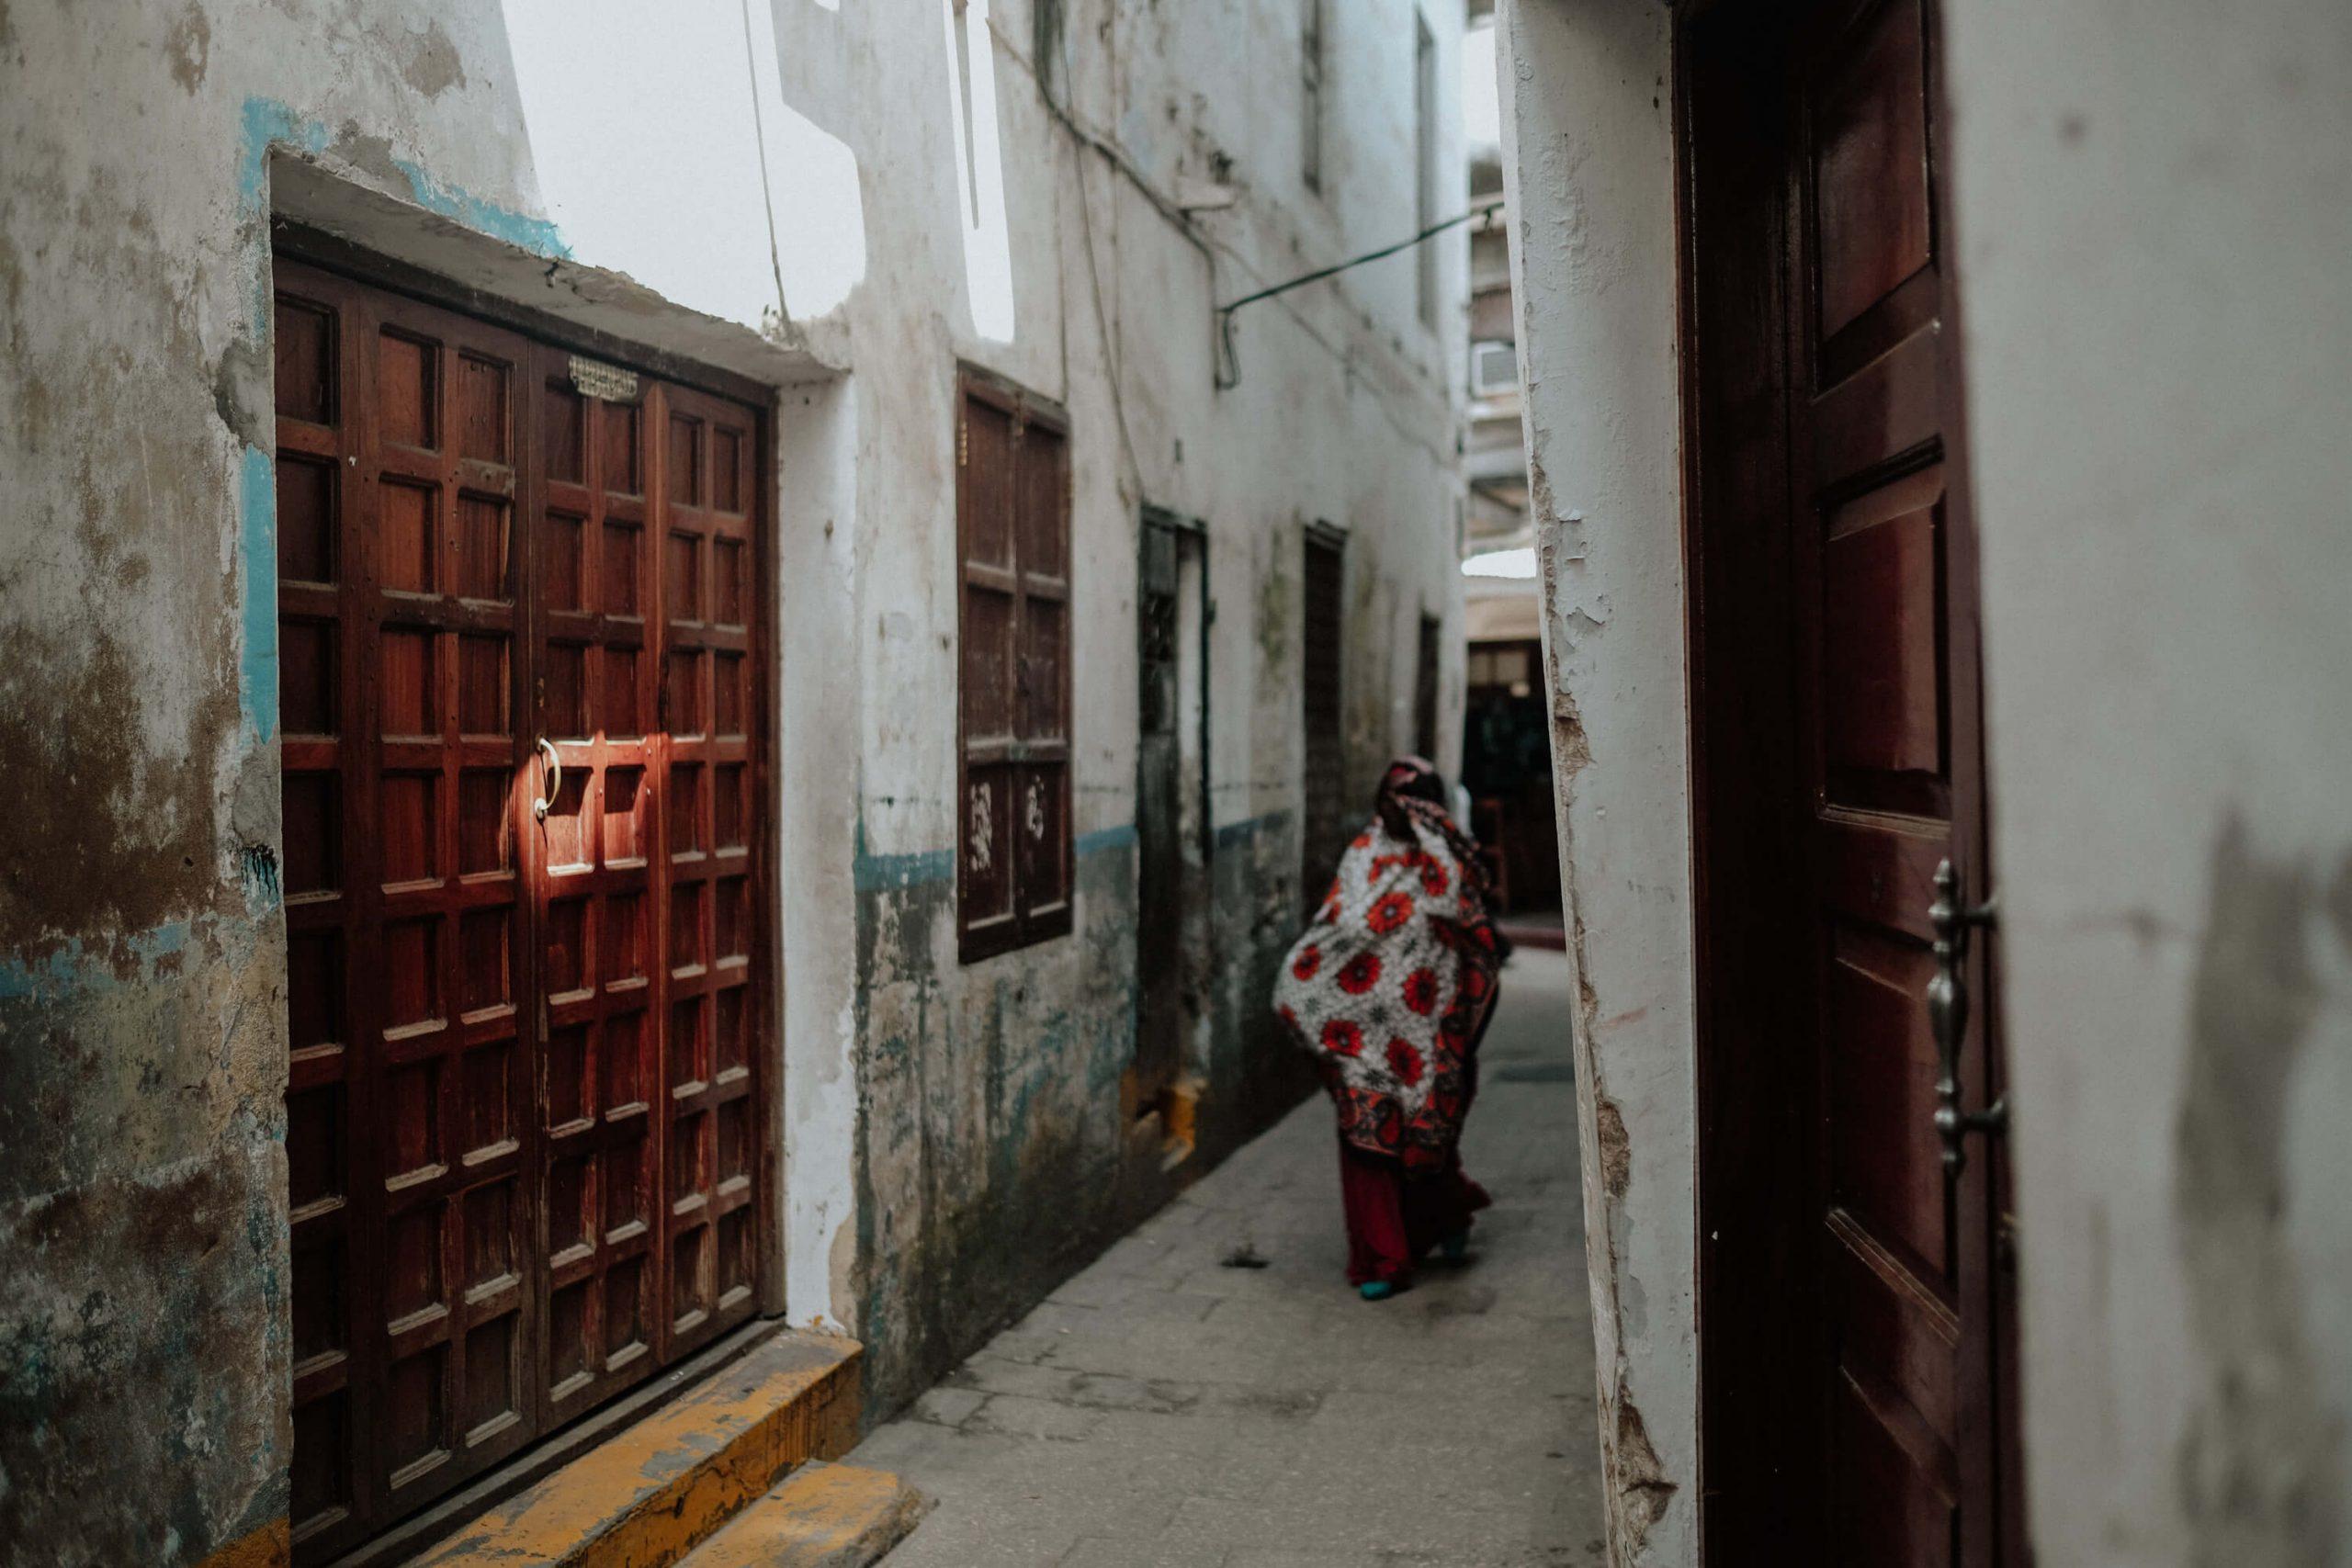 elisabetta riccio - POLE POLE - Woman walking in the old town - stone town - zanzibar